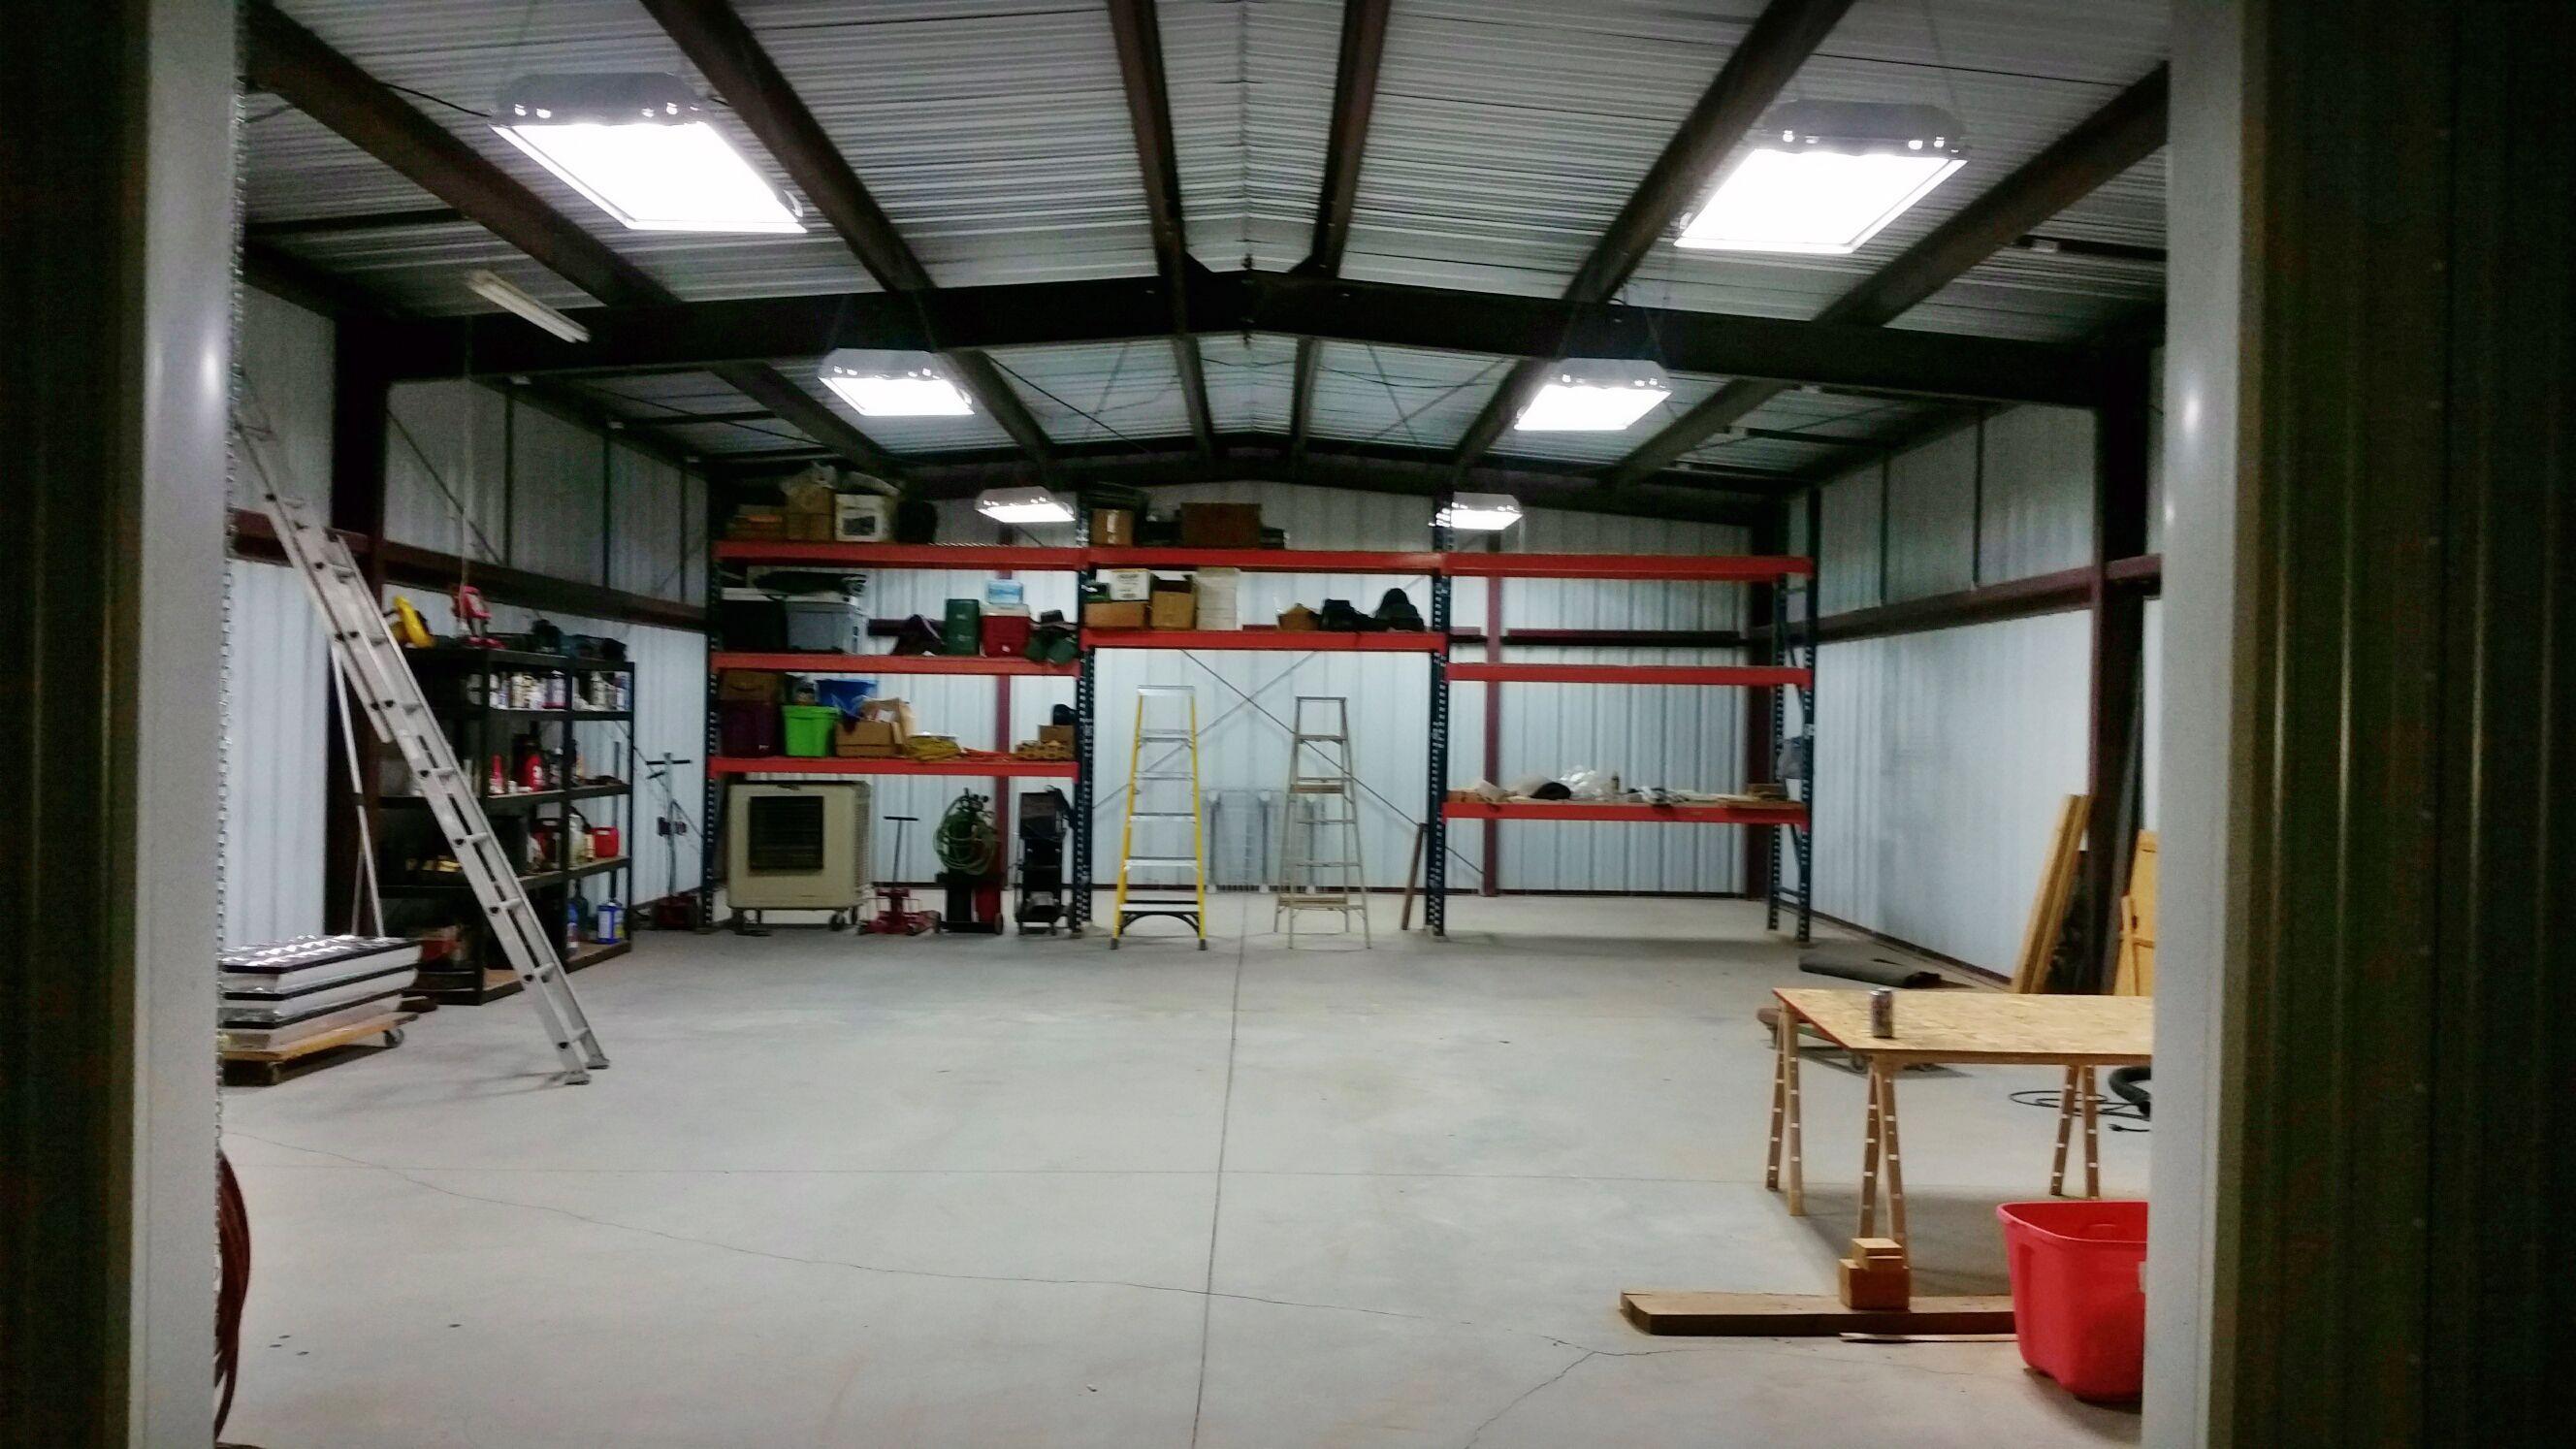 Metal Workshop Buildings Workshop Plans Ideas Workshop Plans